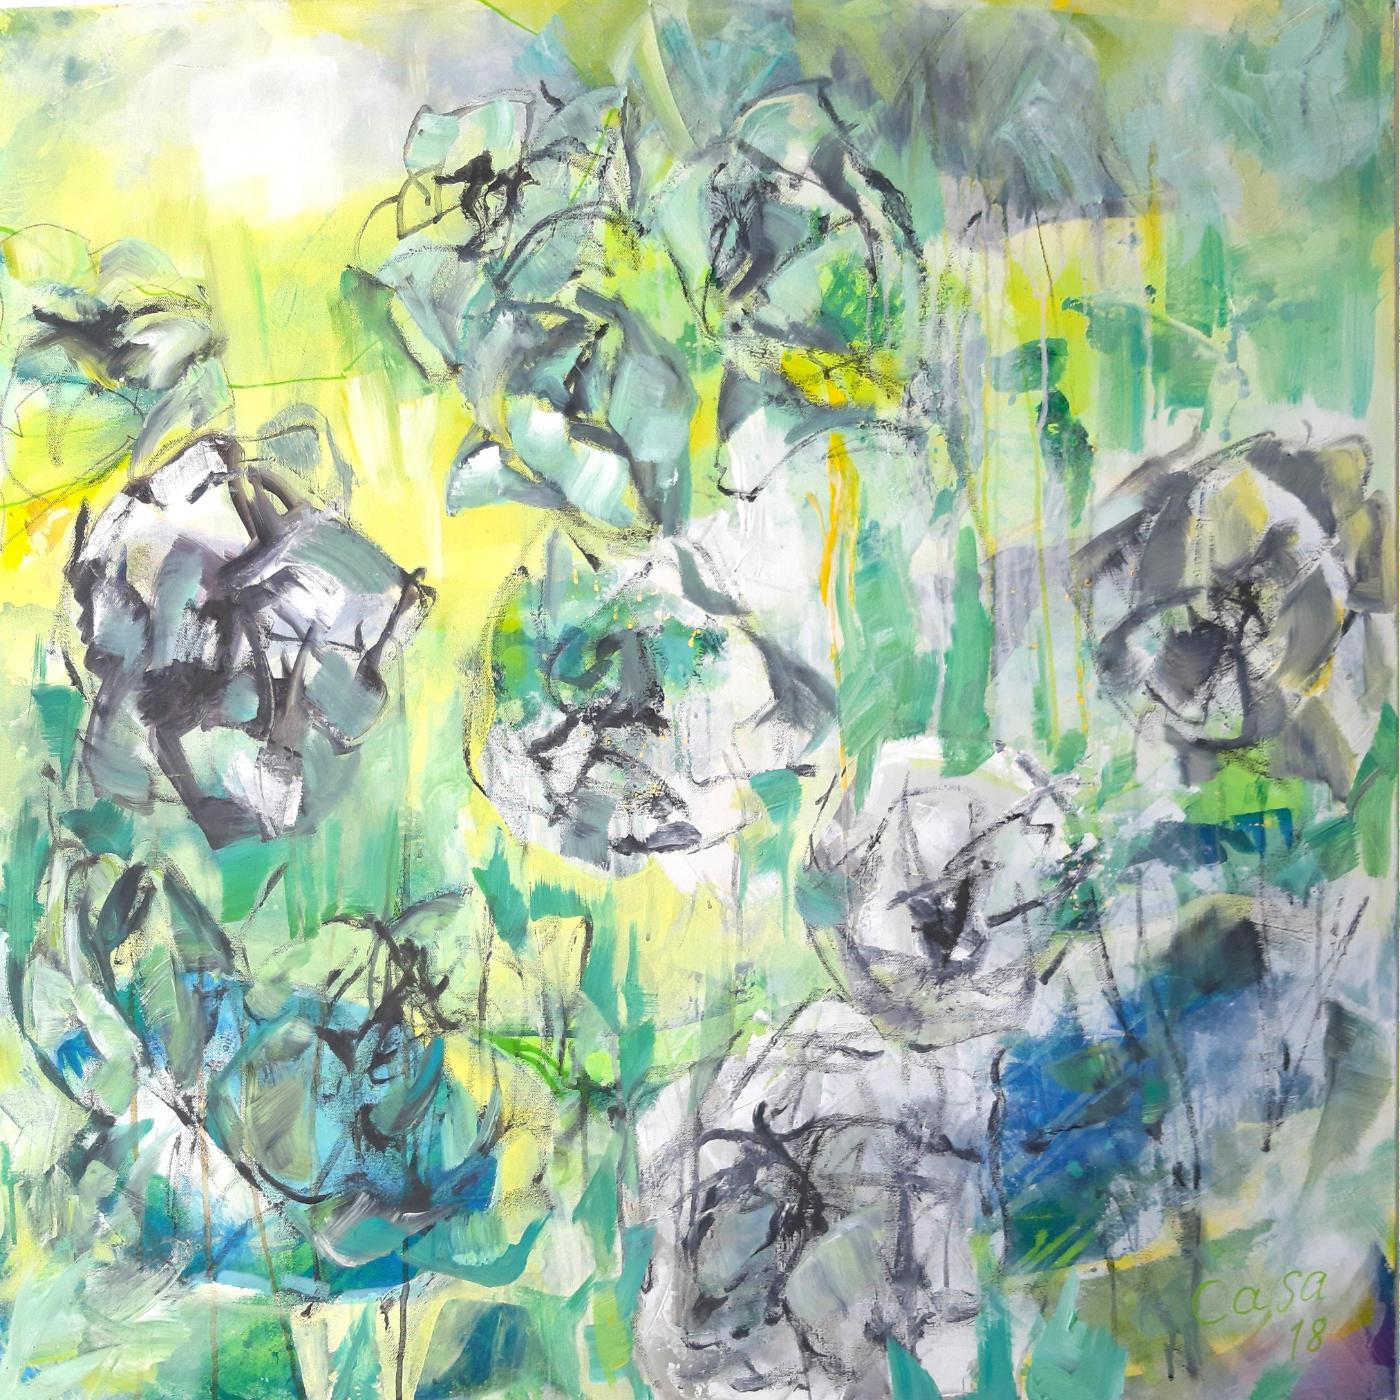 Reigen Rose - Acryl, mixed media auf Leinwand, 100 x 100 cm